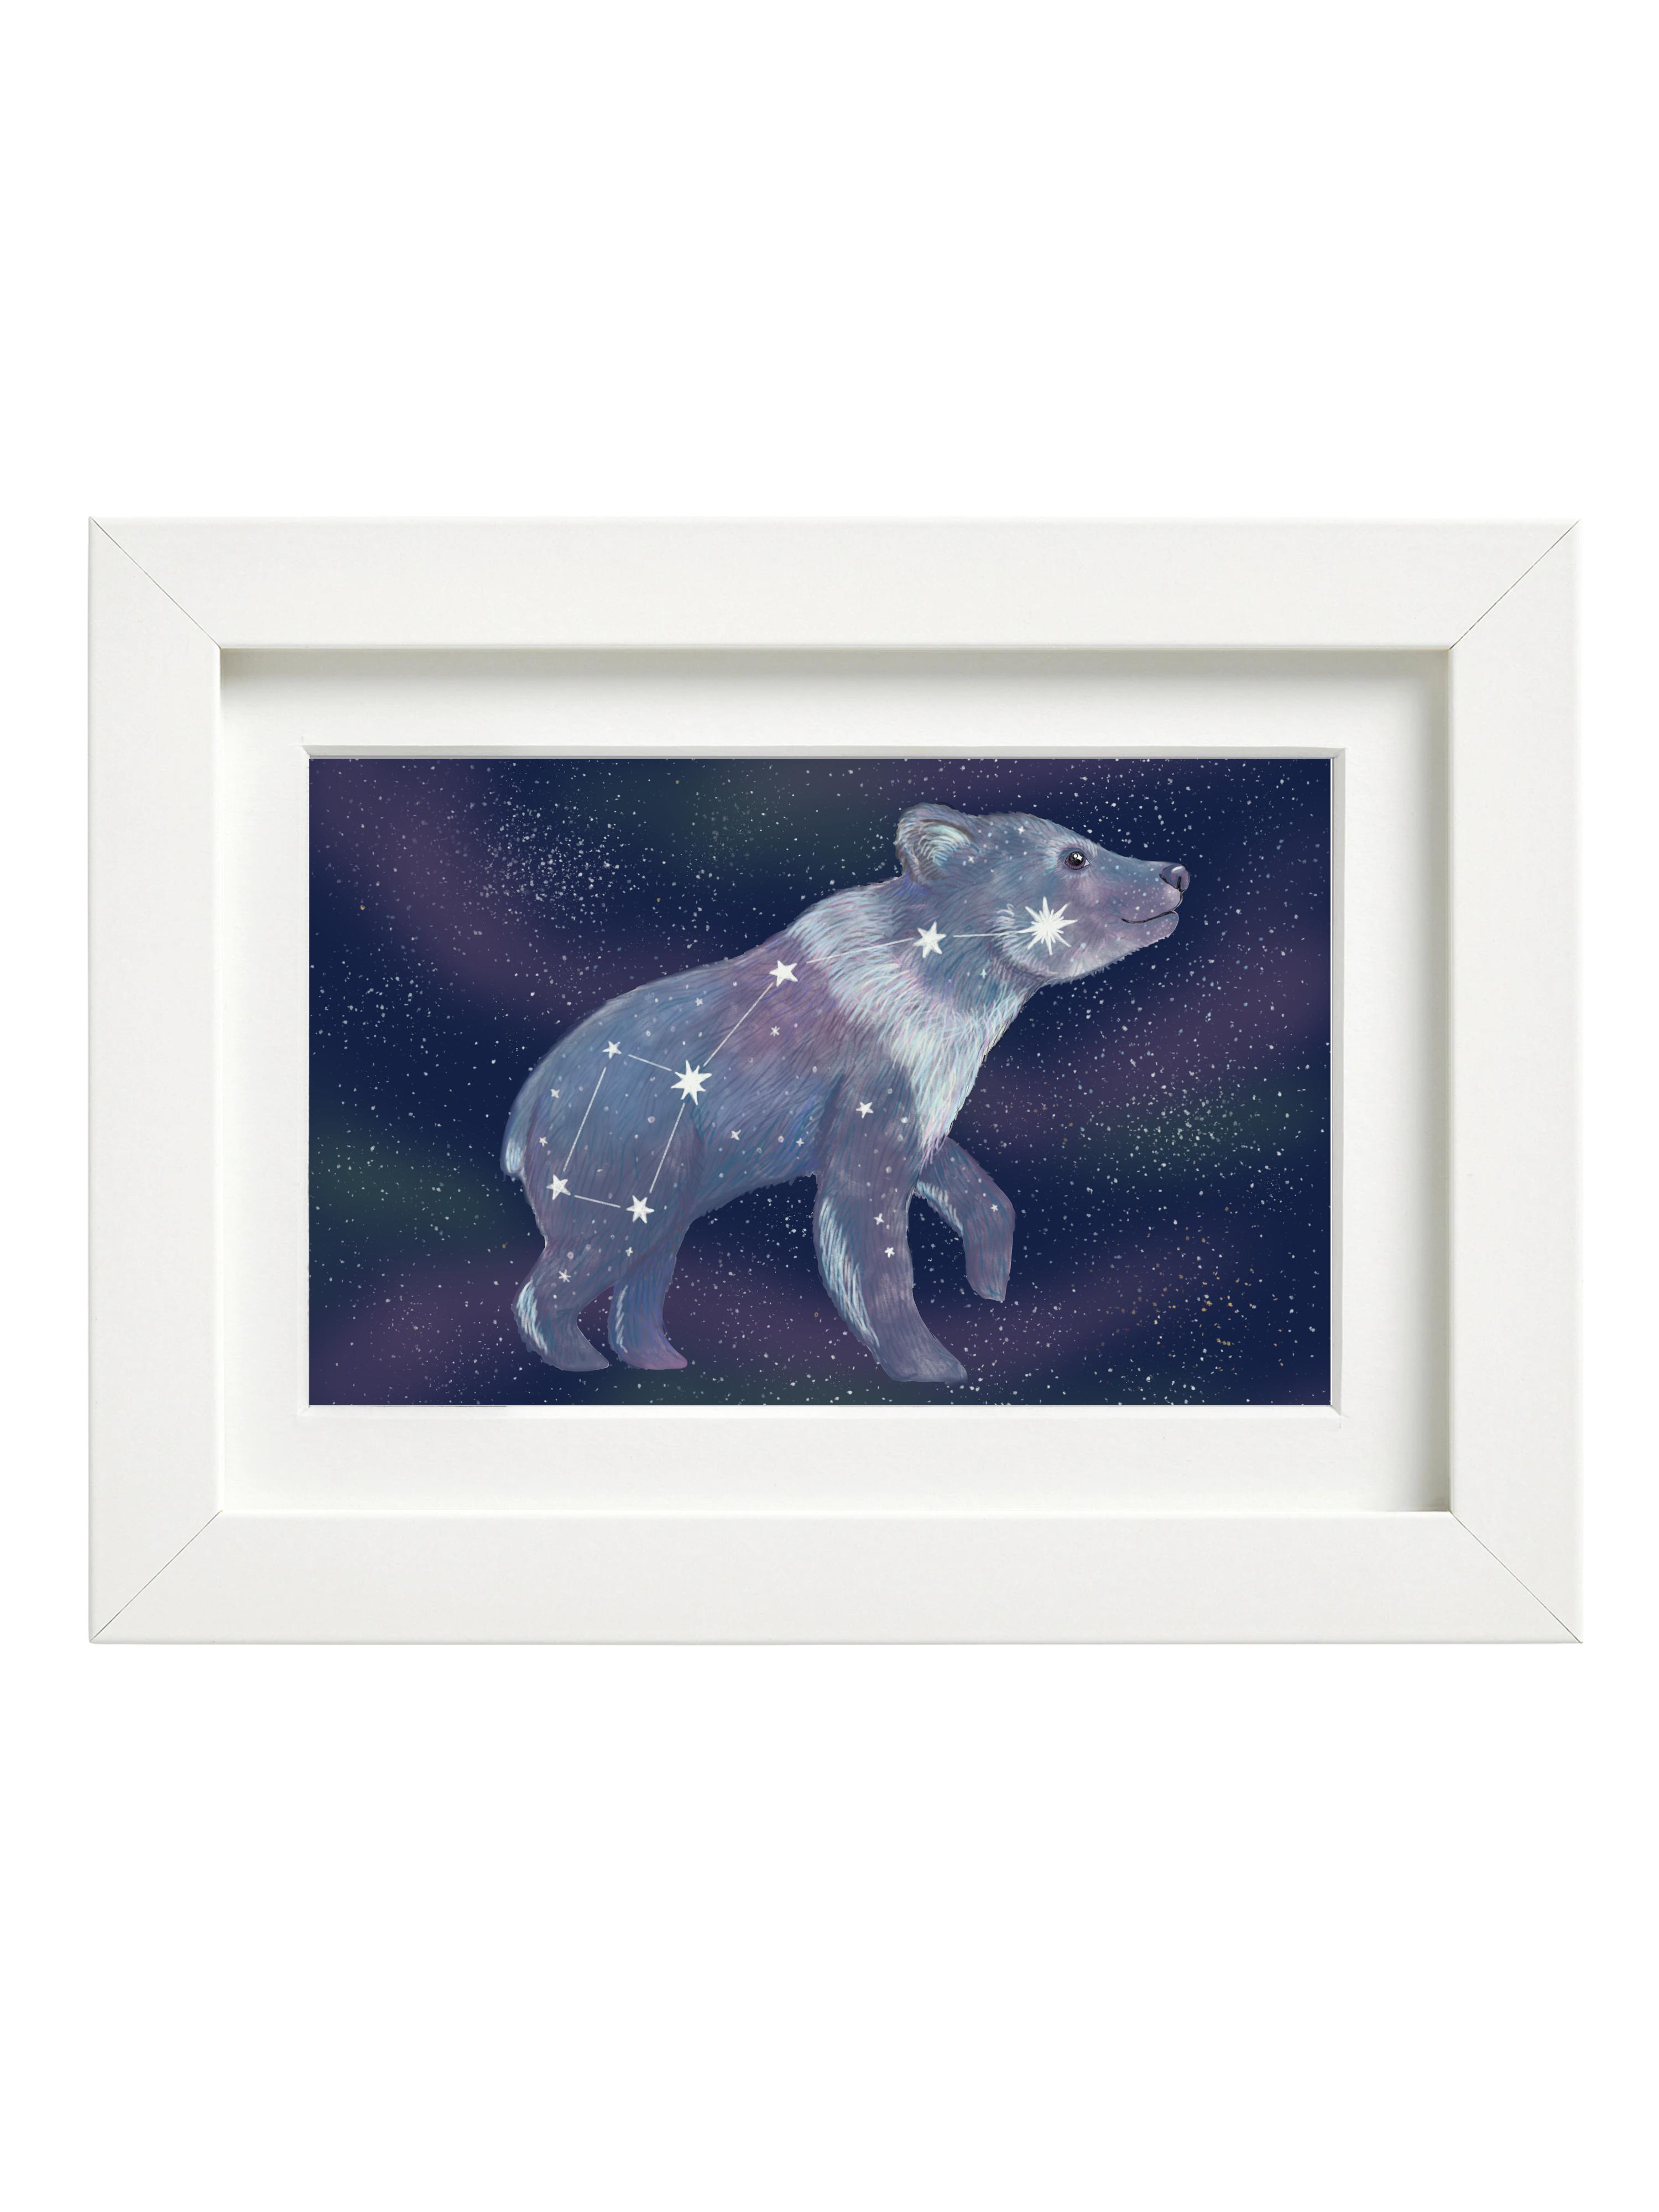 Little Ursa Minor Cub